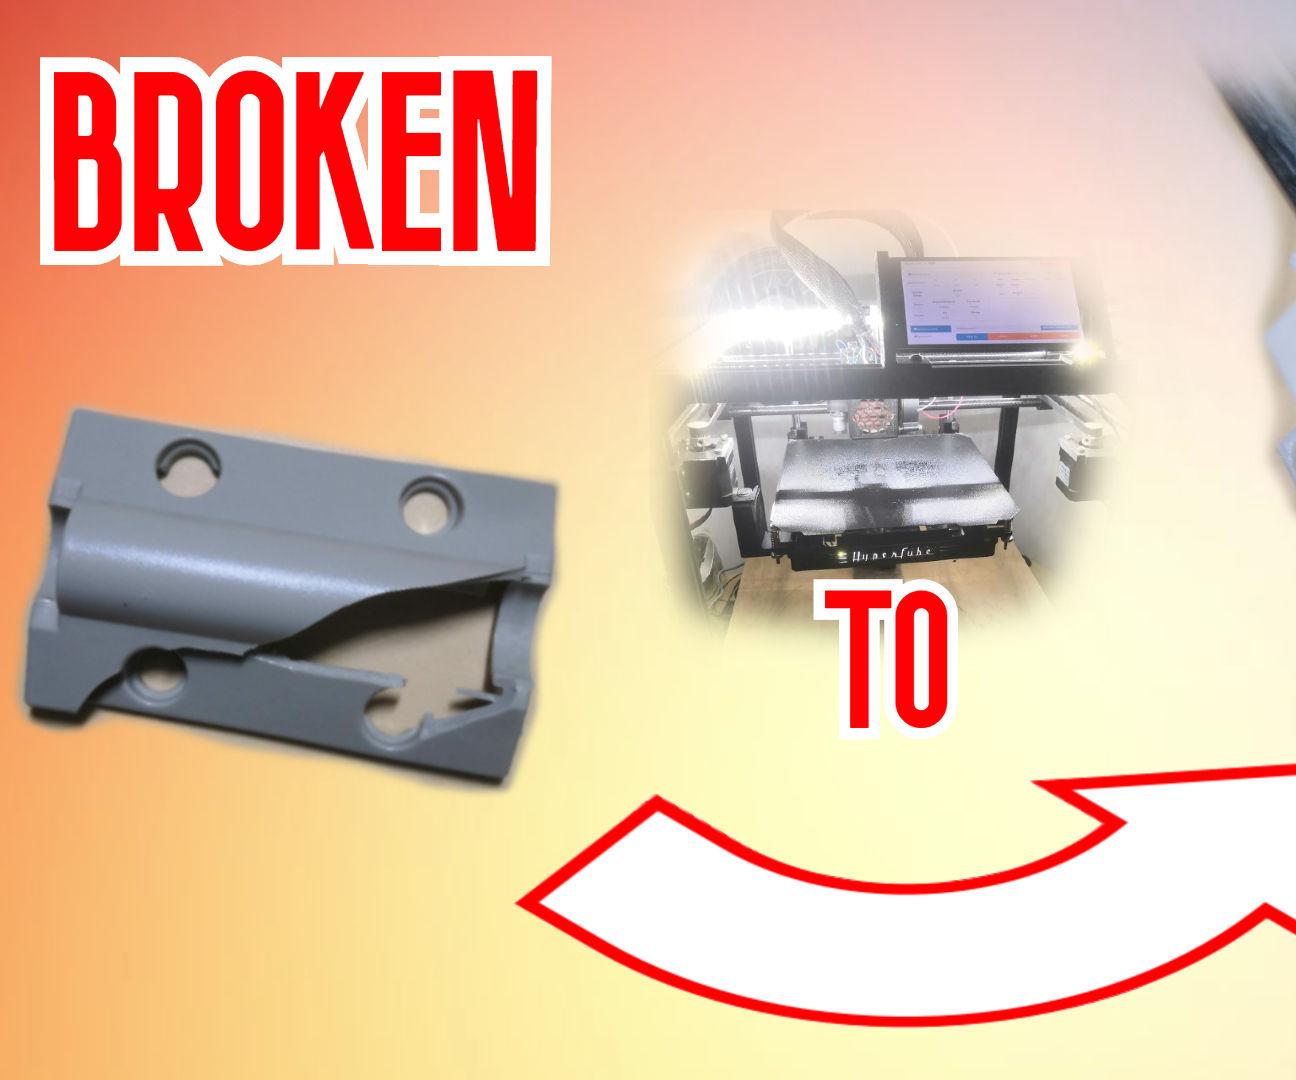 Designing/Repairing Household Items Using Fusion 360 (IKEA Desk Runner)